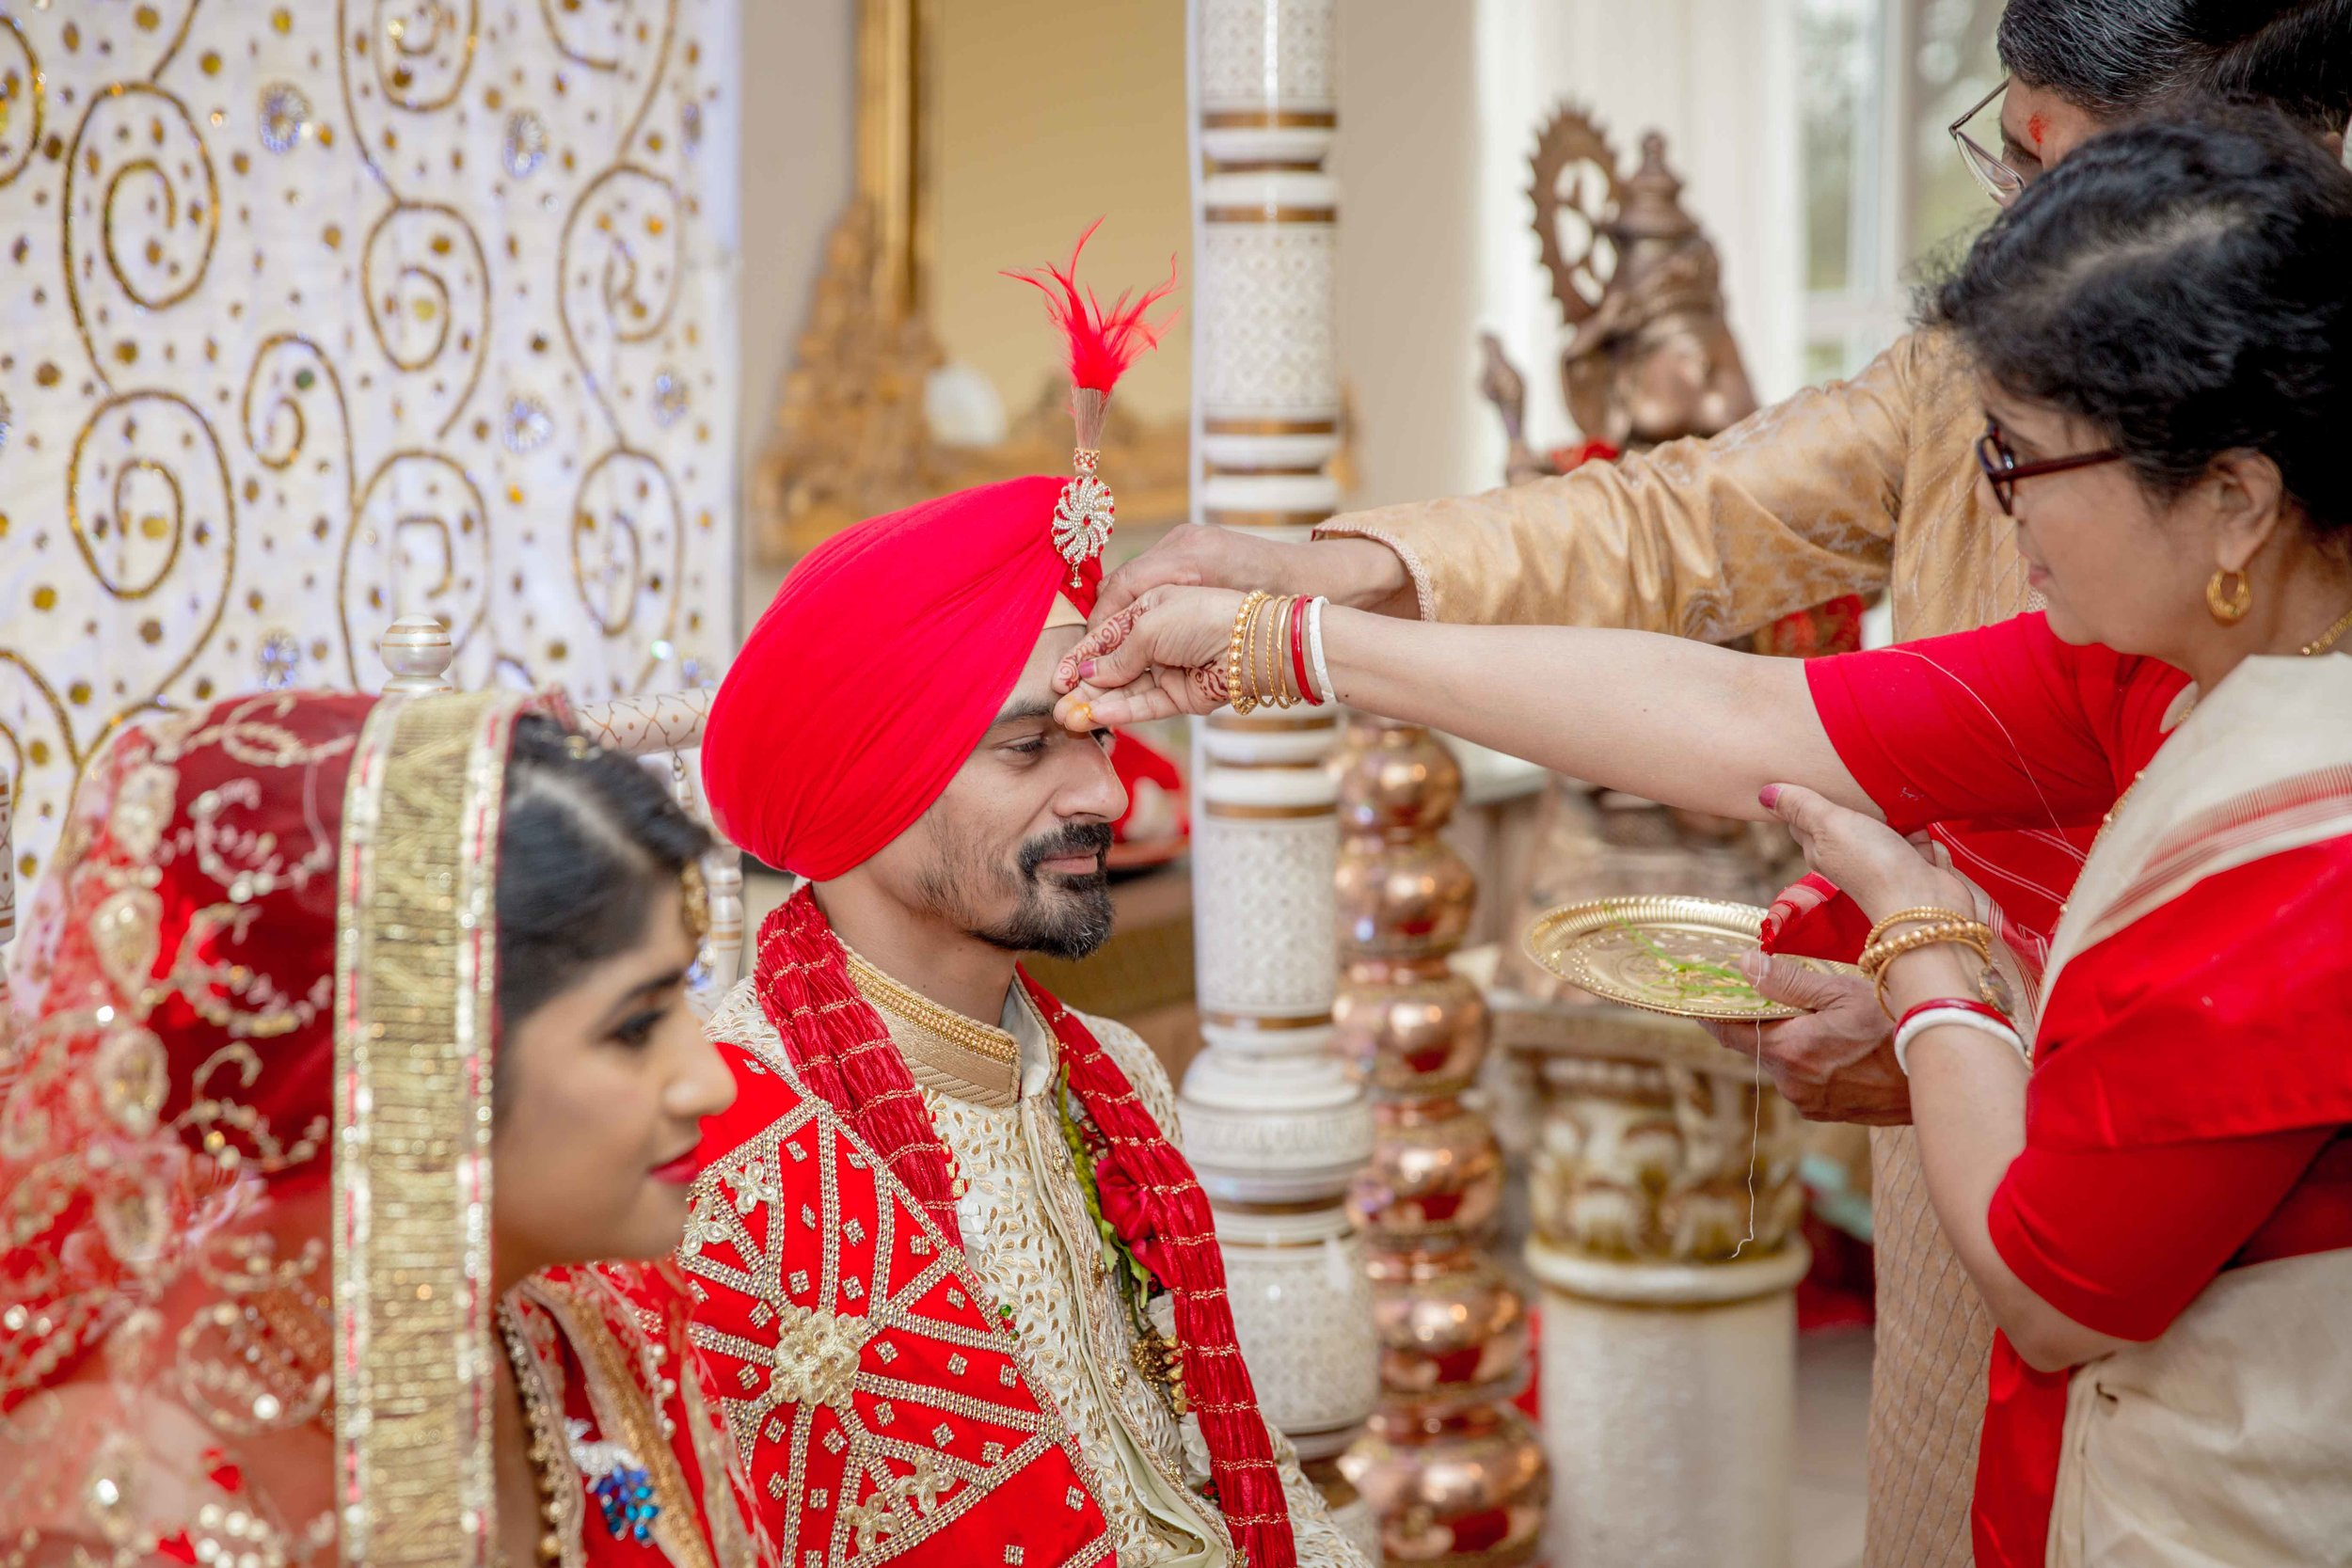 ramada-park-hall-hotel-birmingham-wolverhampton-hindu-wedding-asian-wedding-photography-natalia-smith-photography-22.jpg